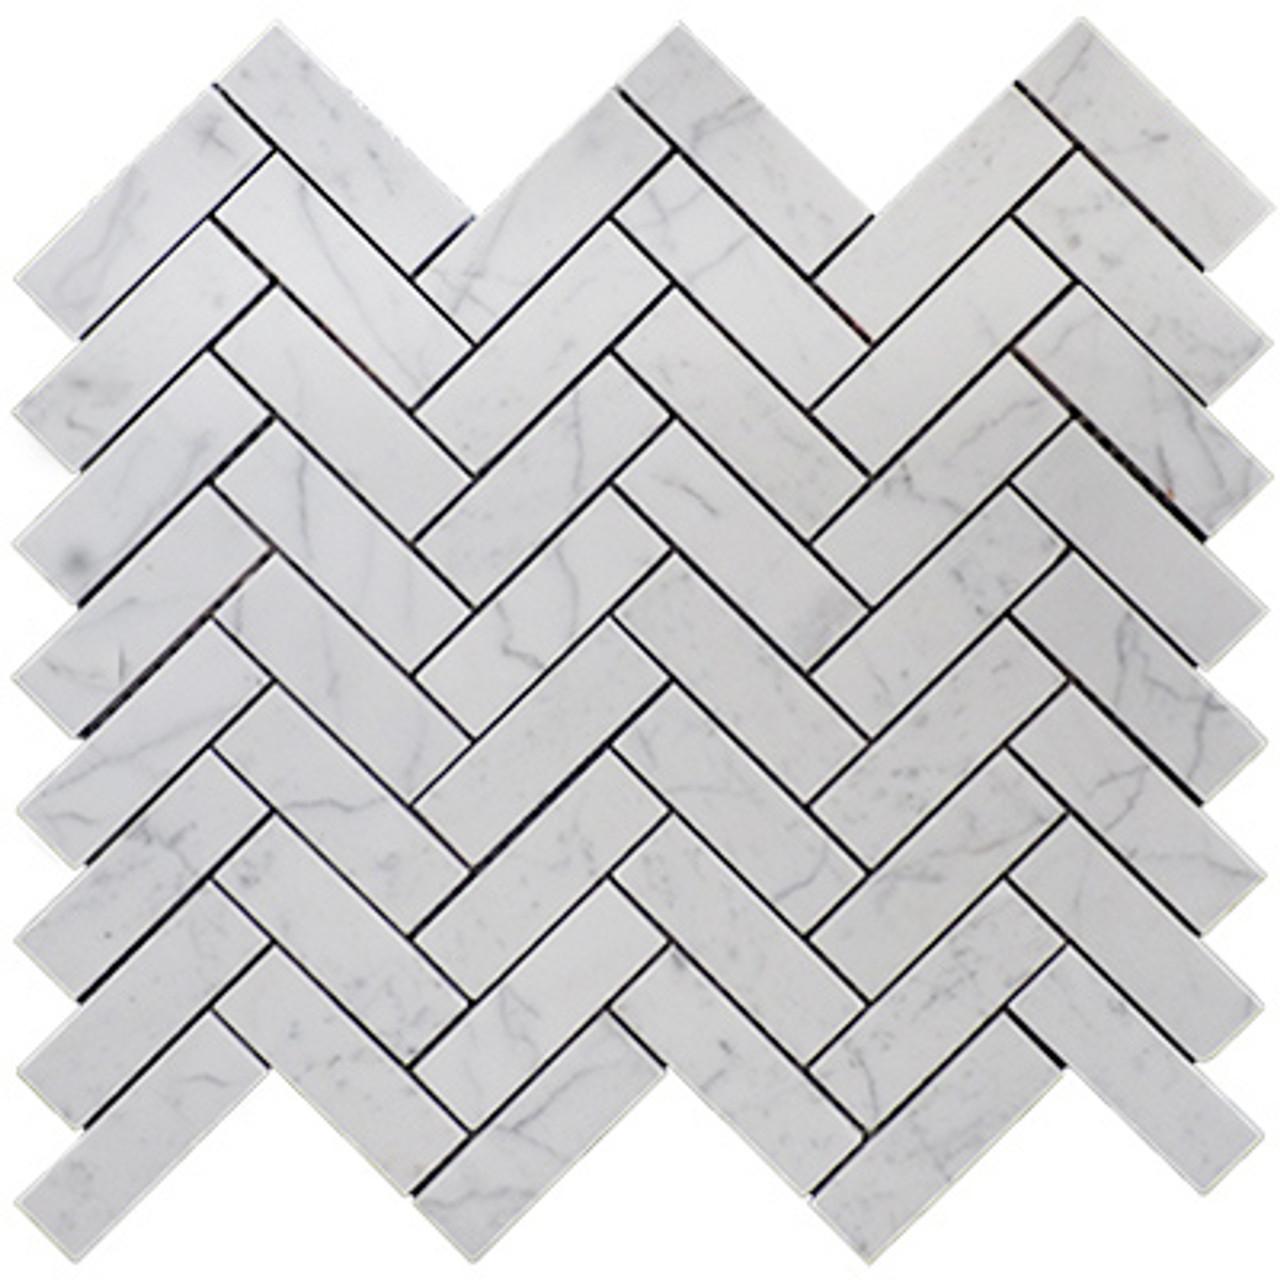 1 X 3 Carrara Marble Herringbone Mosaic Tile Honed